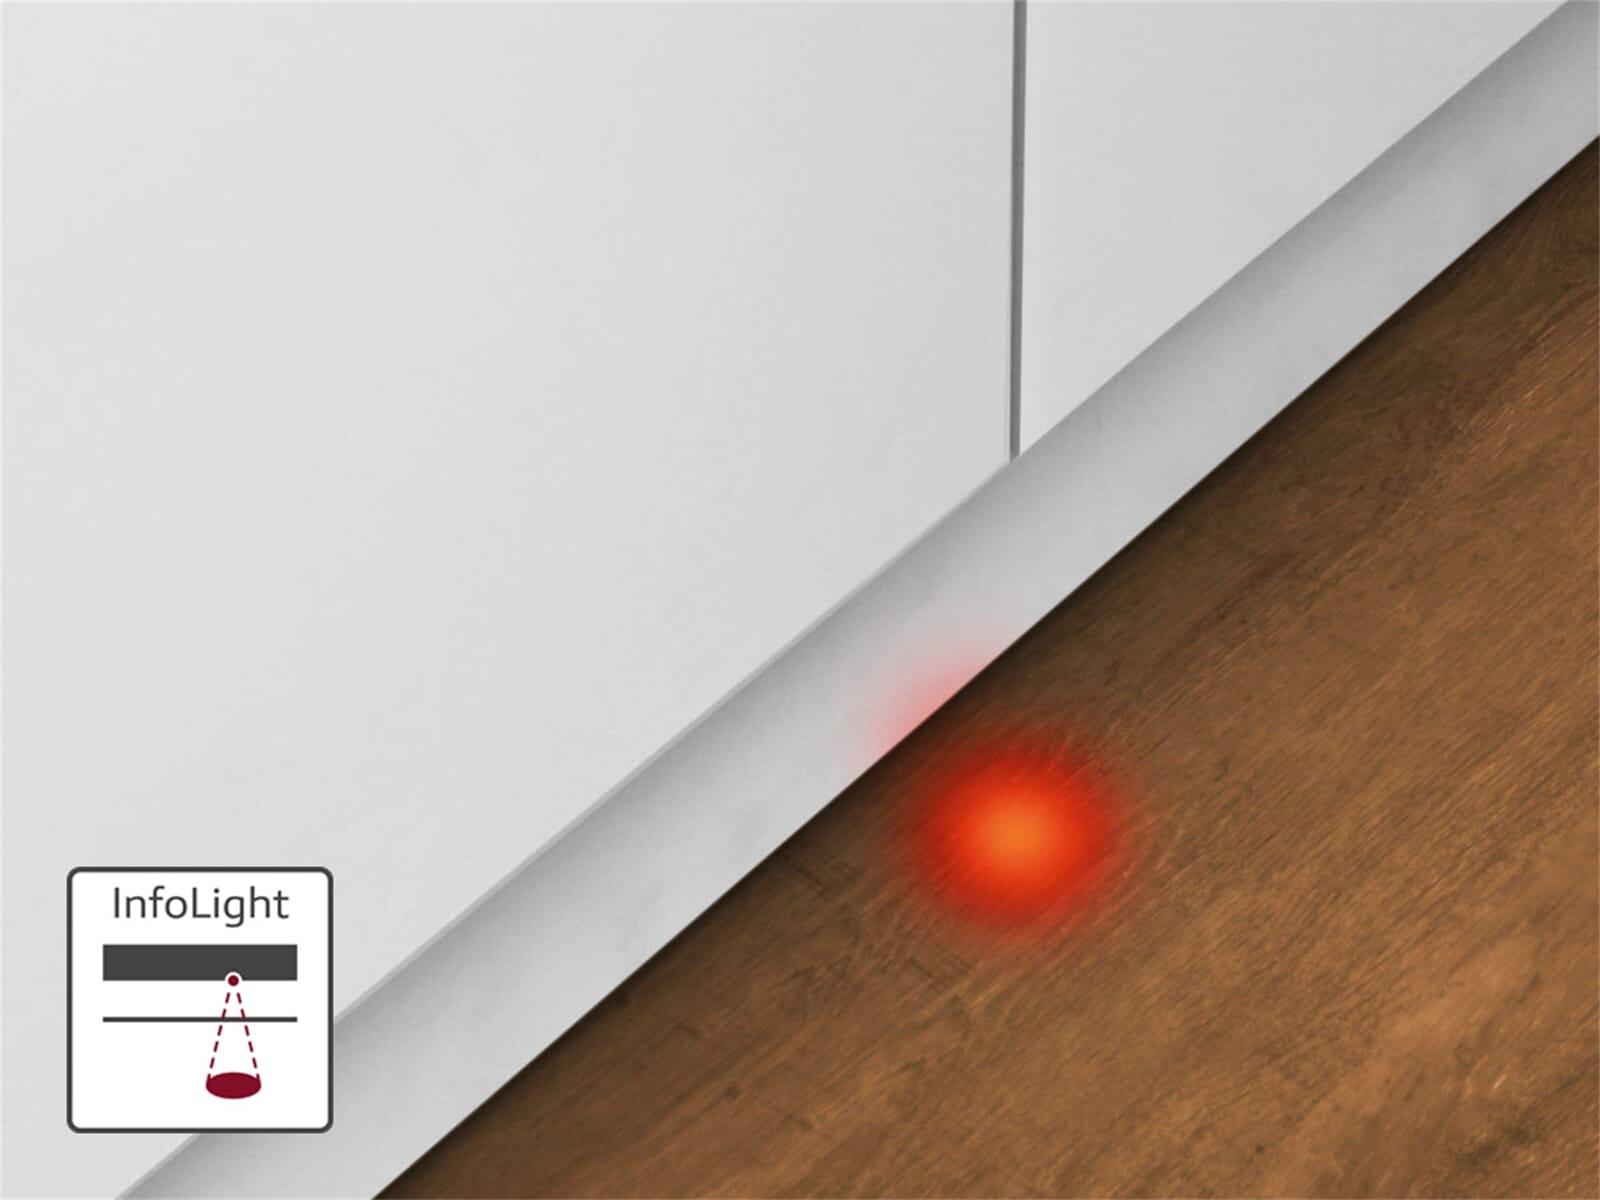 neff gx 669 vollintegriert einbauger t geschirrsp lautomat sp lmaschine sp ler ebay. Black Bedroom Furniture Sets. Home Design Ideas